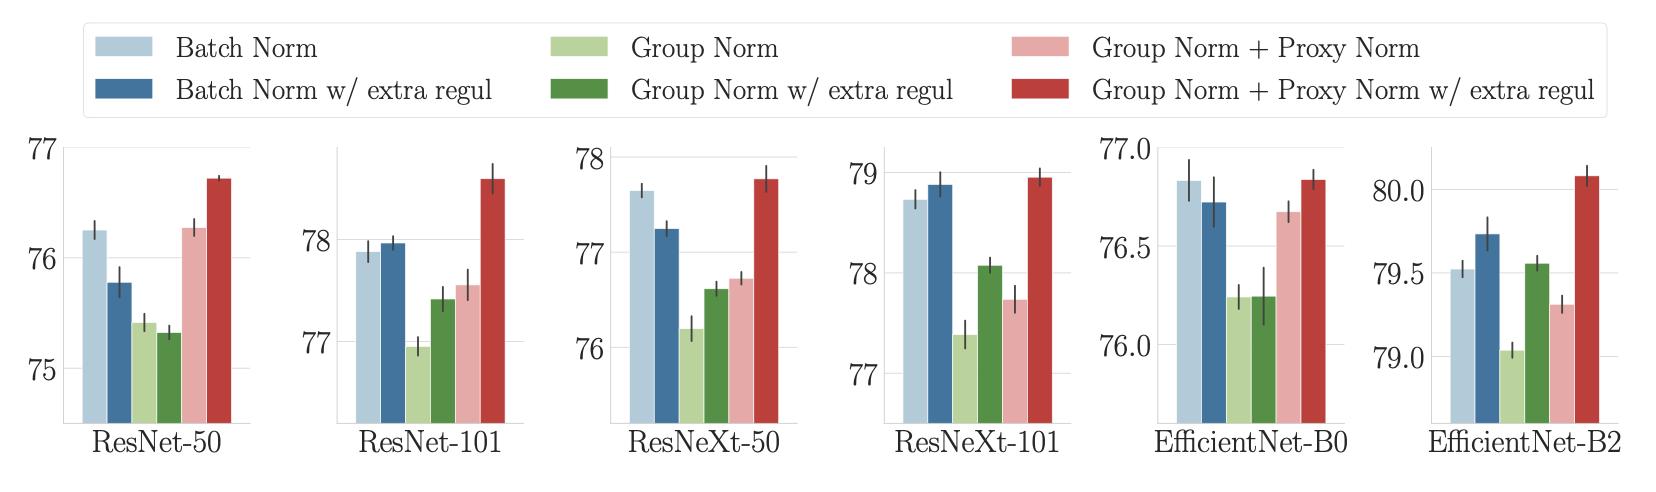 Proxy Norm Figure 4